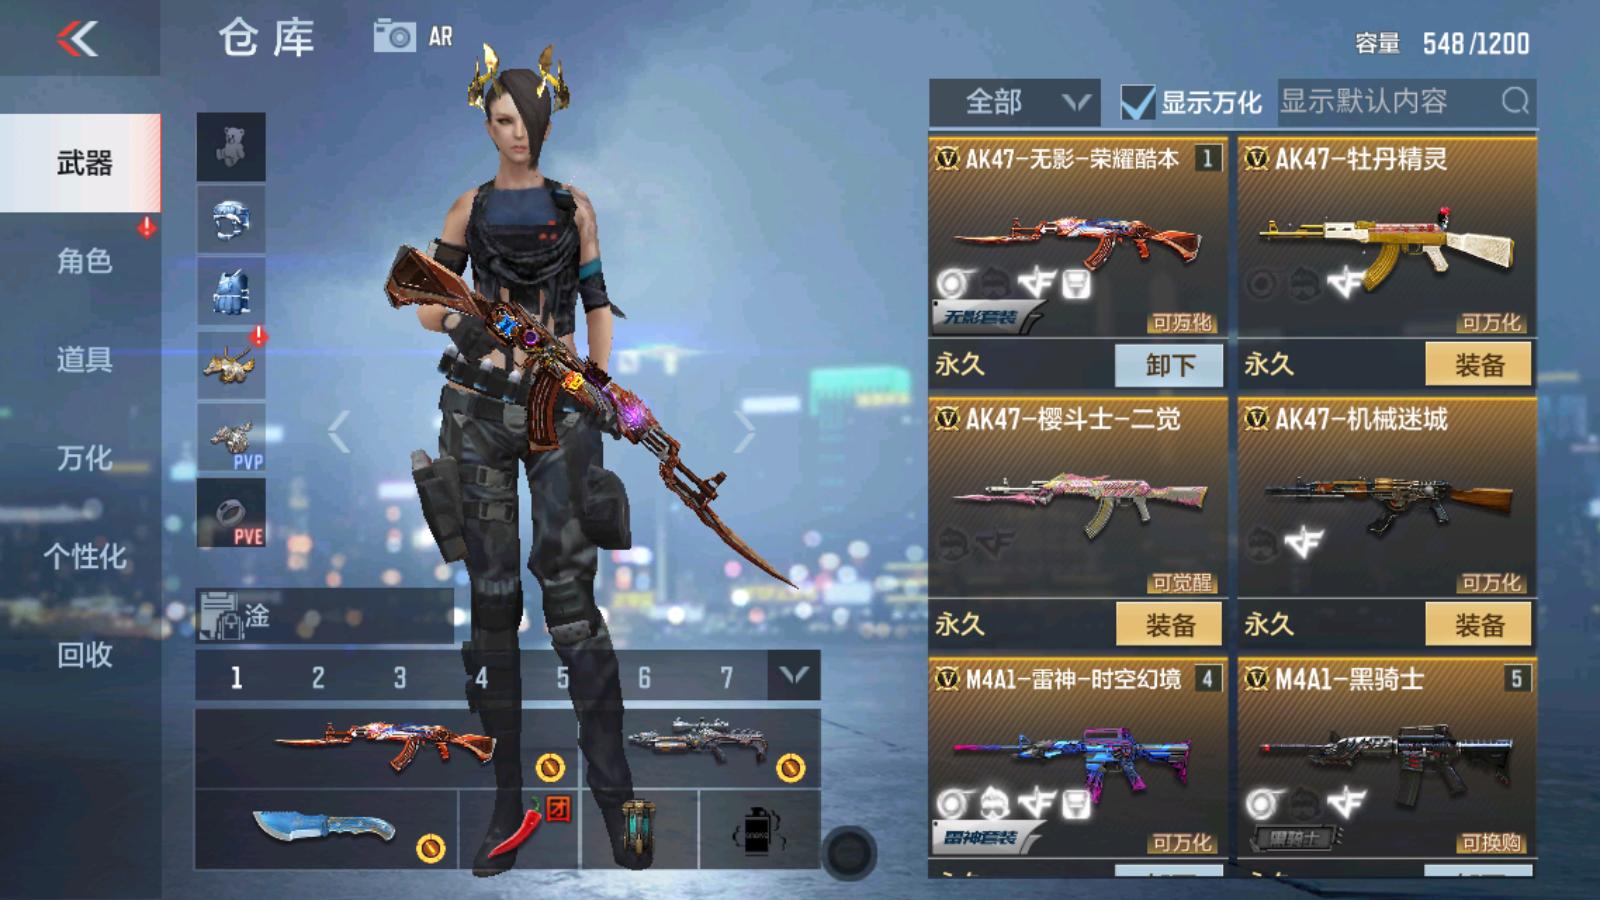 V3,31V,无影套装,毁灭套装,雷神套,详情看图~!!!